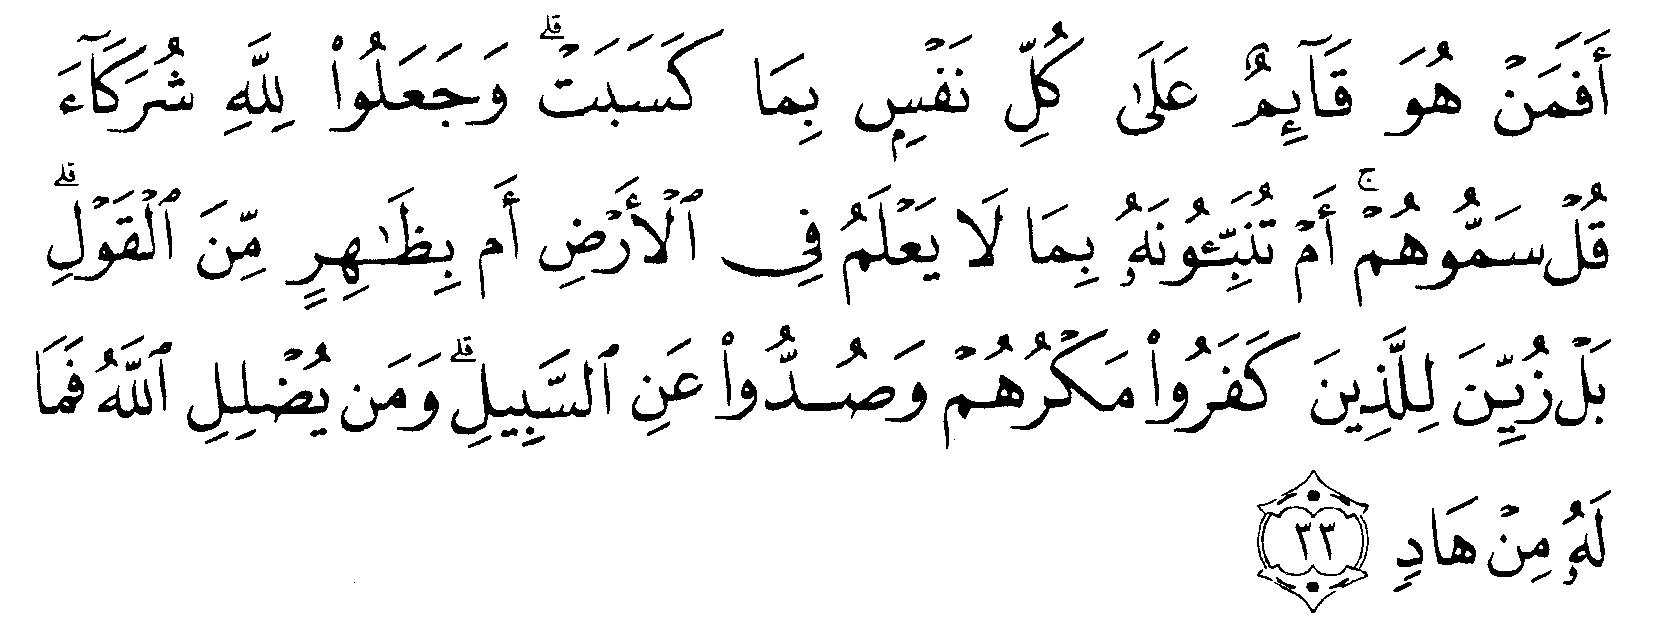 Tafsir Ibnu Katsir Surah Ar Radu Ayat 33 Alquranmulia